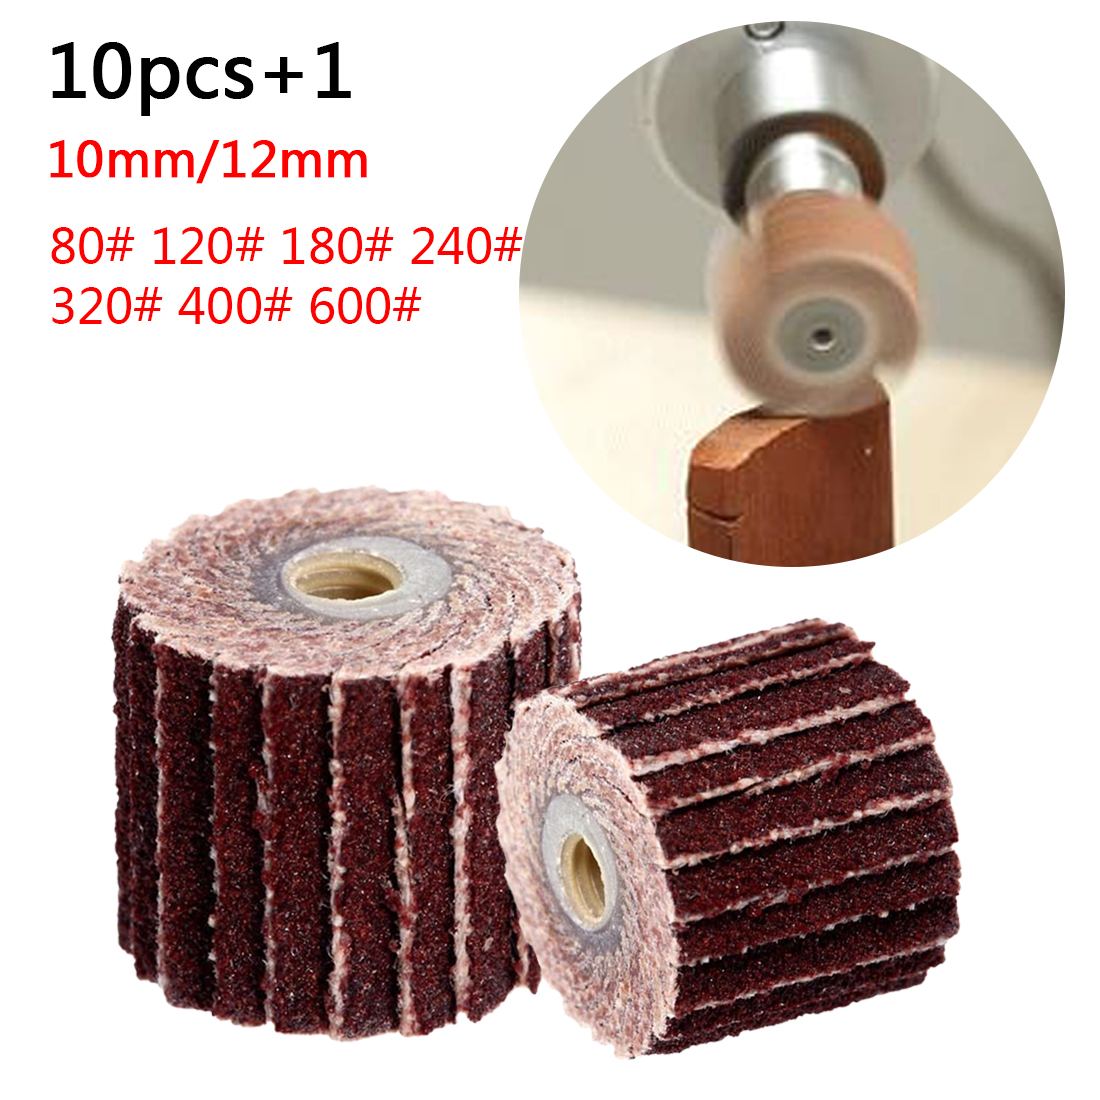 10Pcs Dremel Accessories Sanding Flap Disc Grinding Sanding Flap Wheels Brush Sand Rotary Tool 10 X 10x 3mm